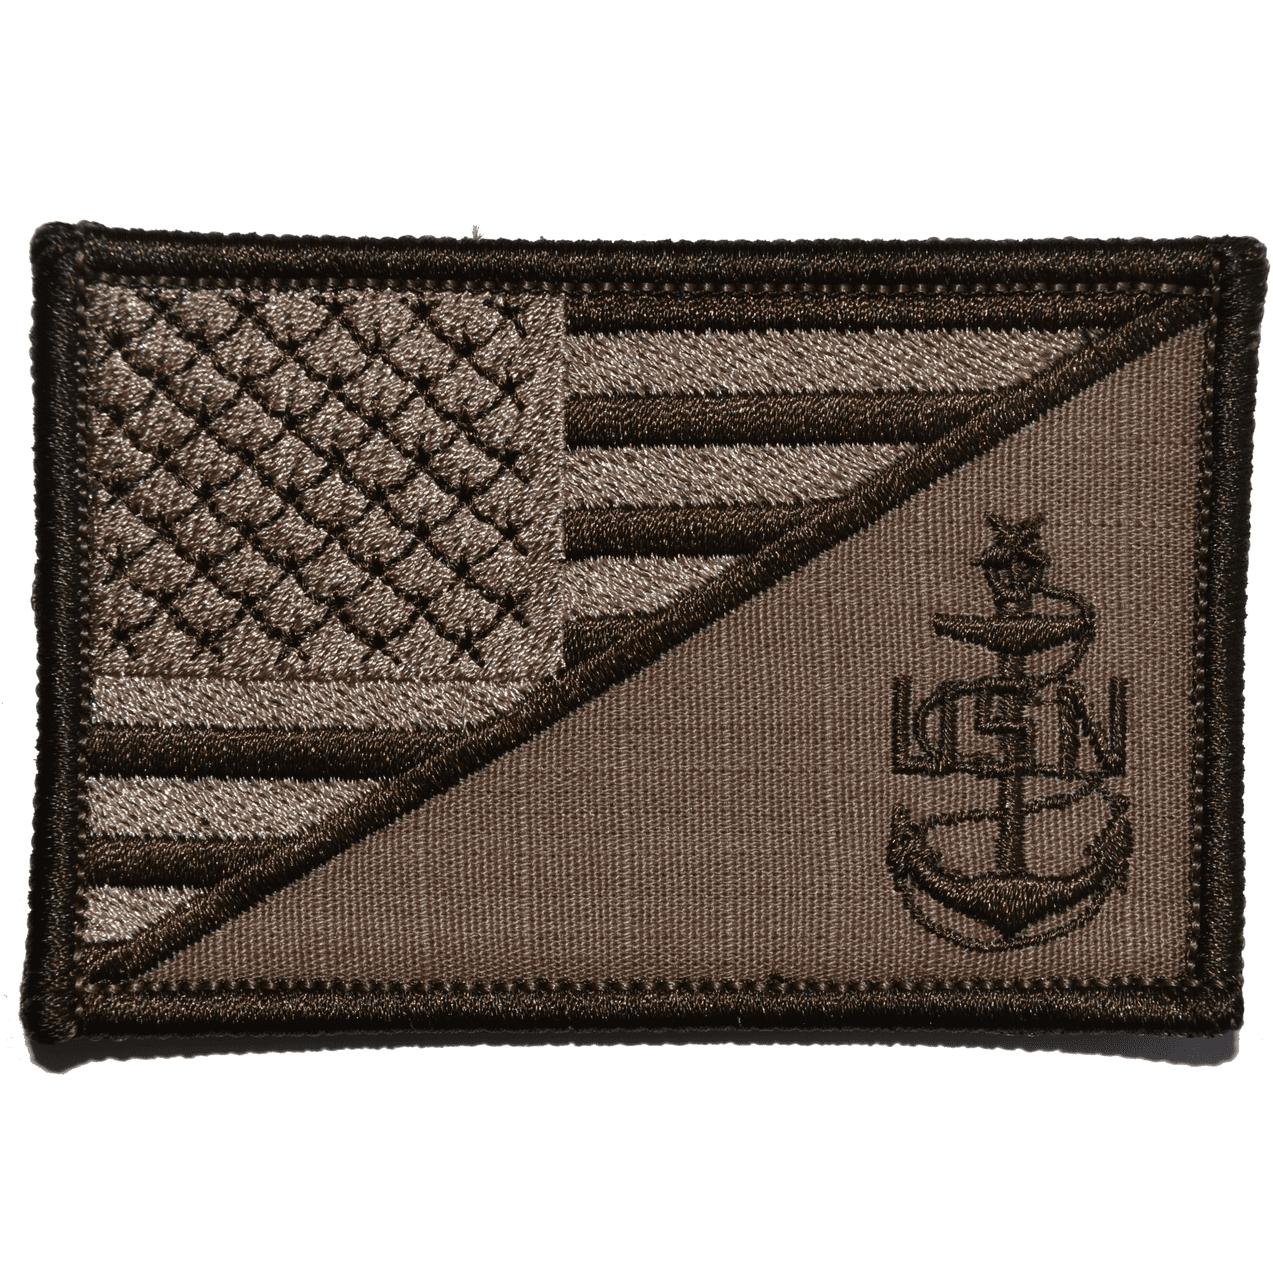 Navy SCPO Senior Chief Petty Officer USA Flag - 2.25x3.5 Patch